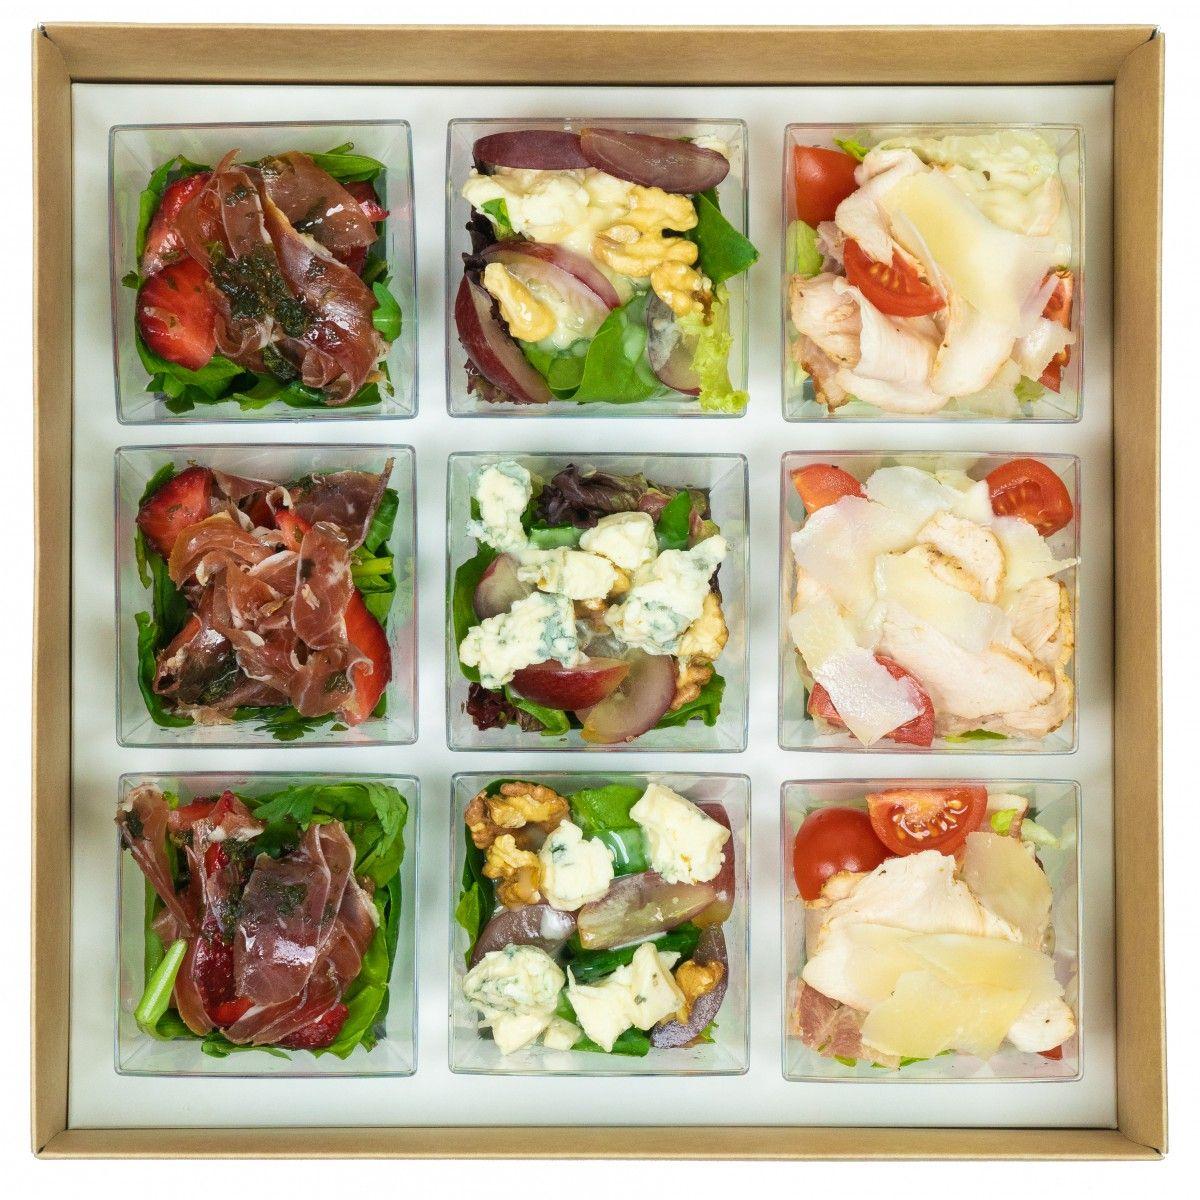 Chef salads smart box фото 1